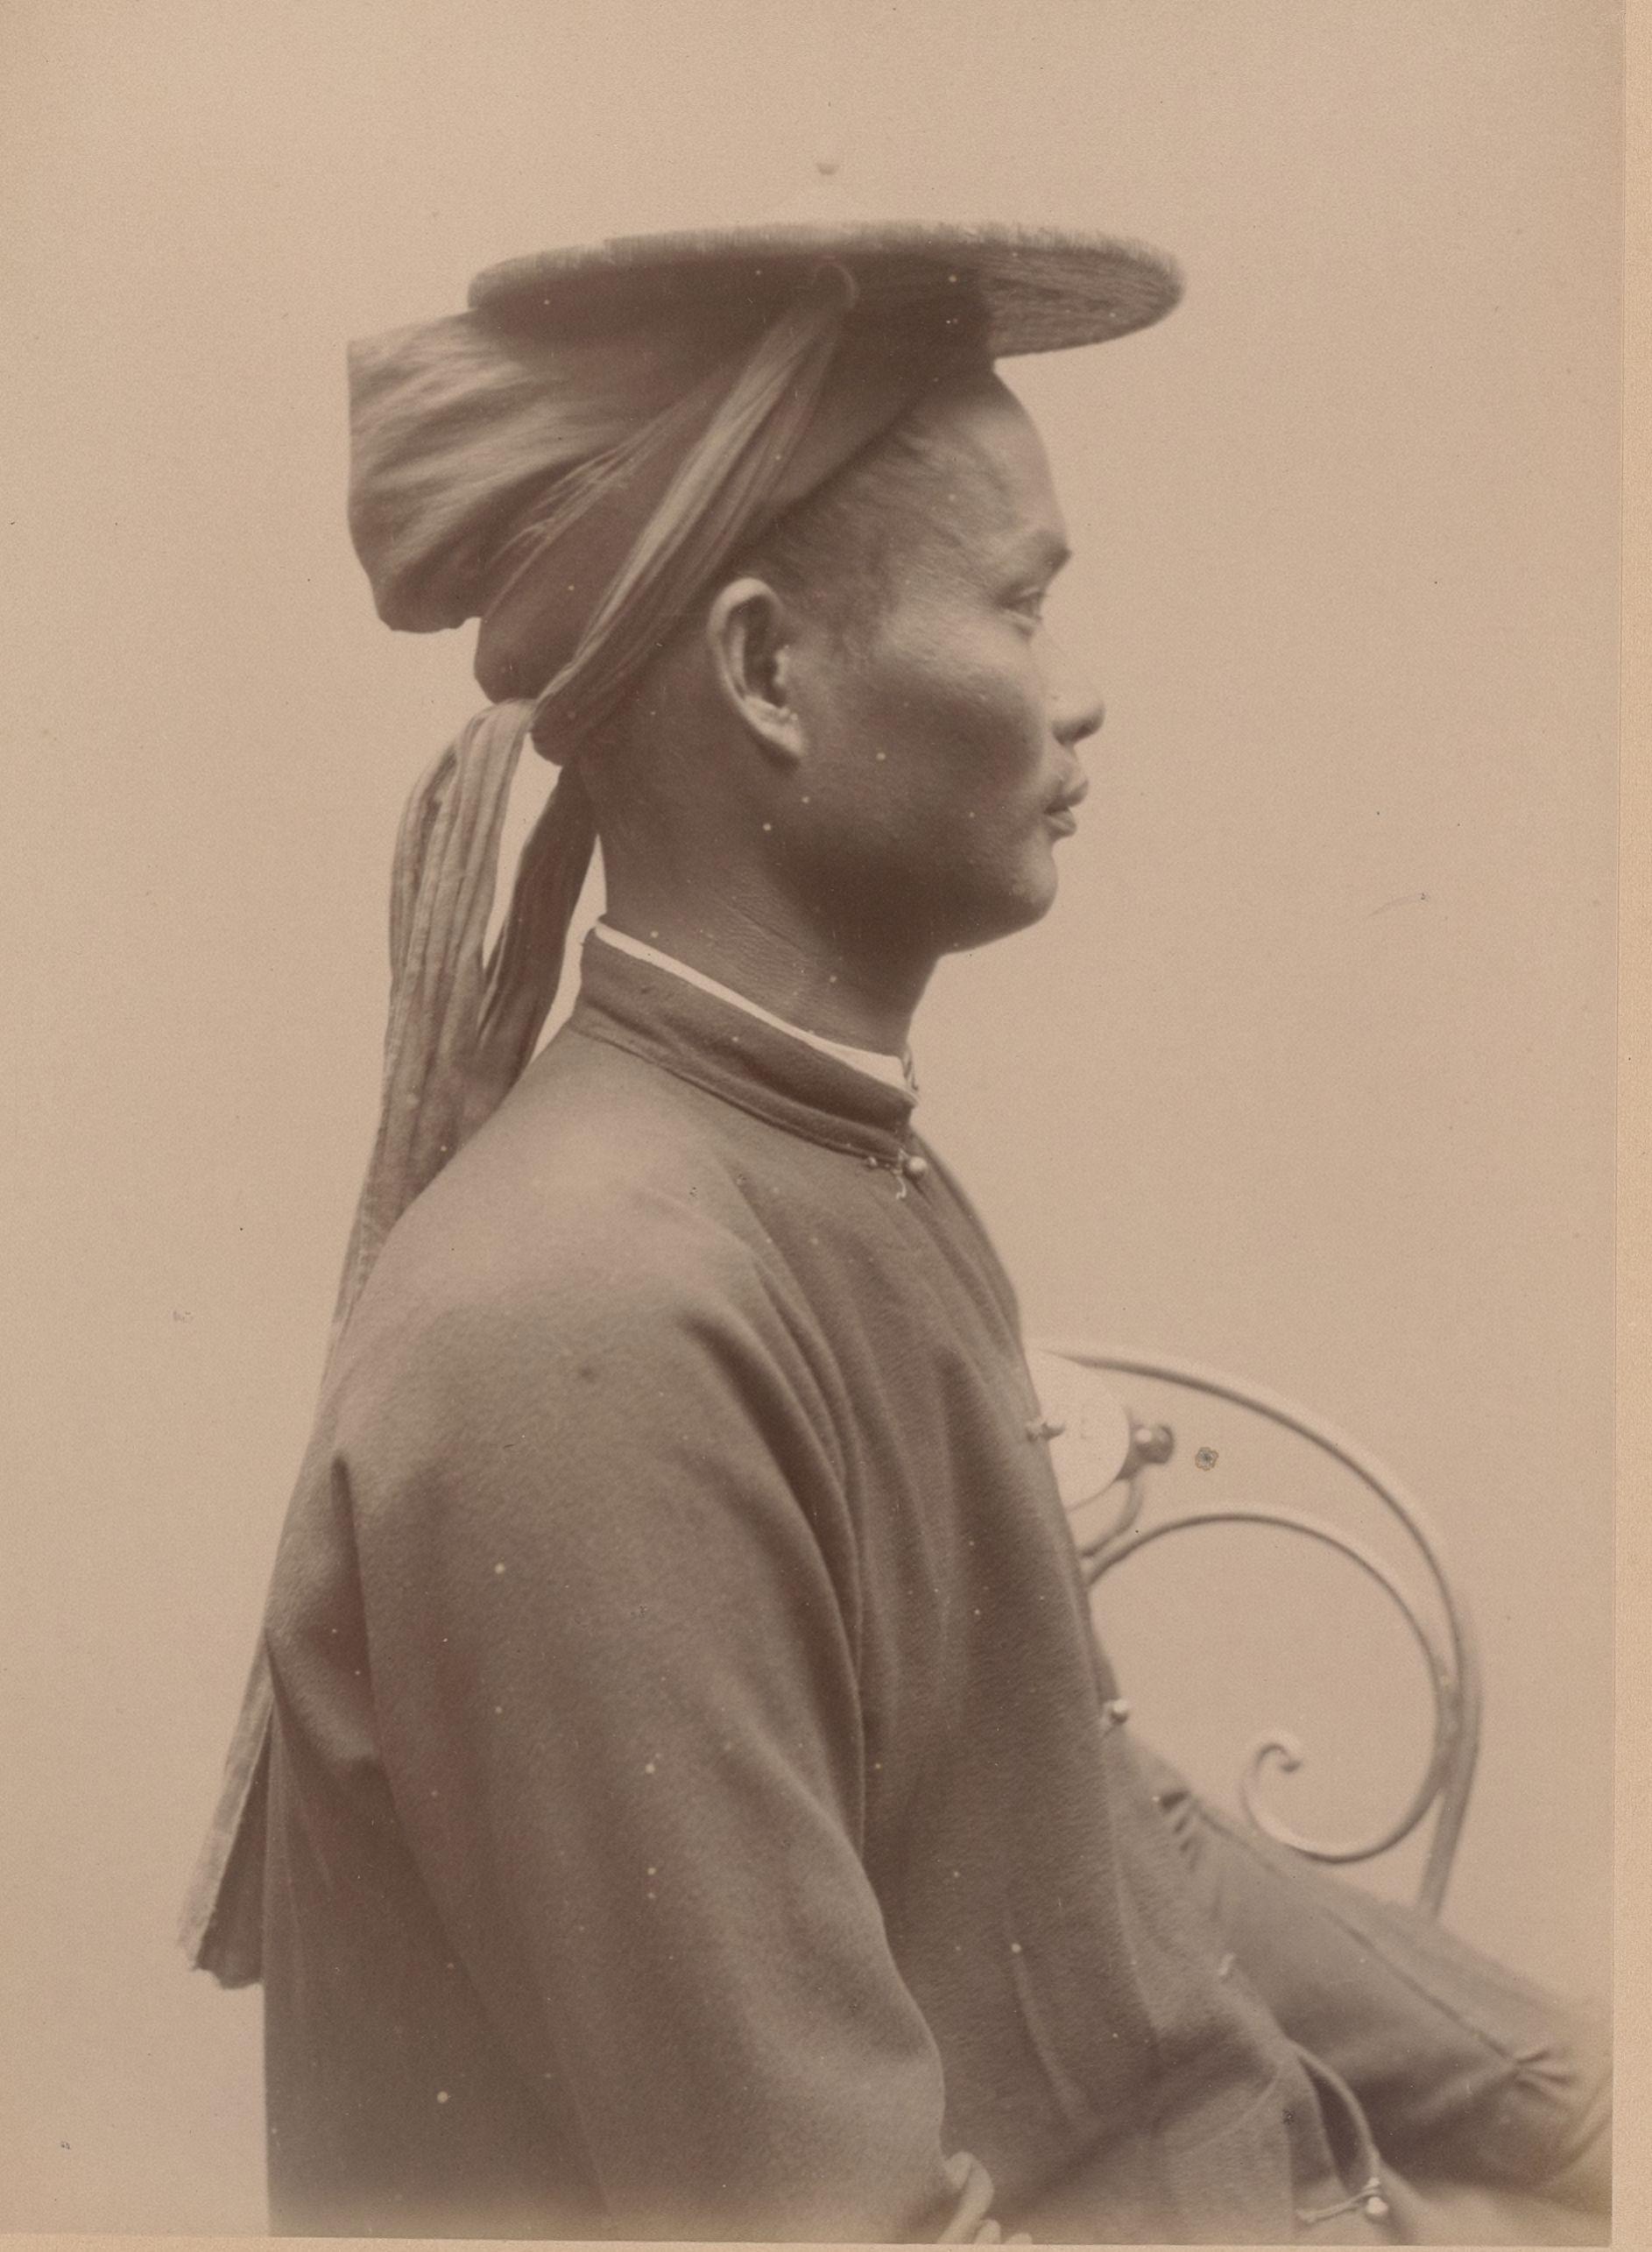 Кьи, 31 год, Сайгон (профиль)